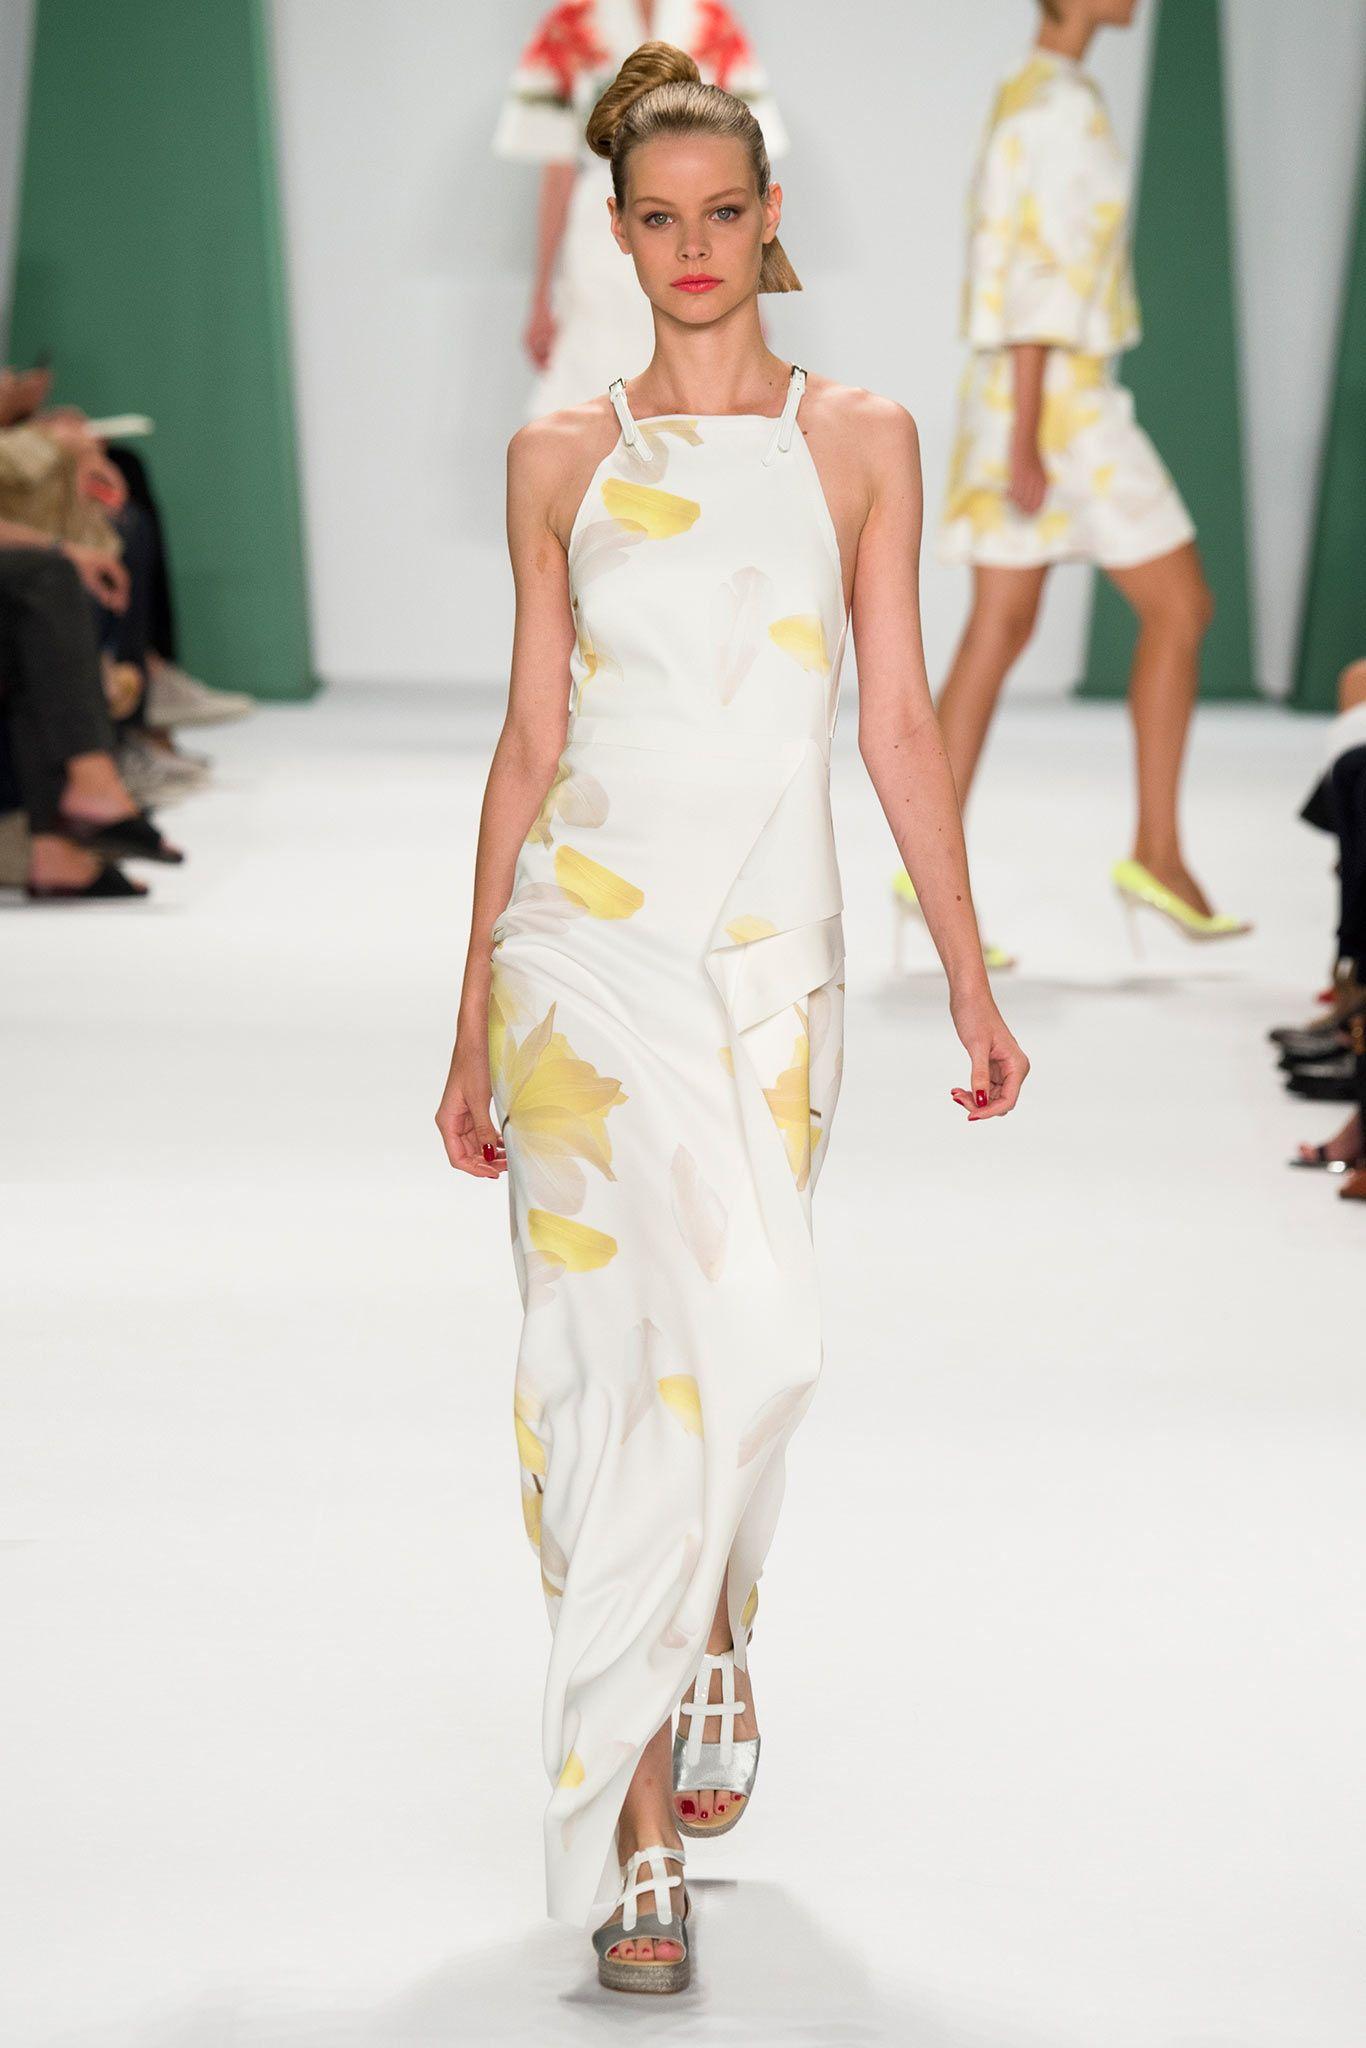 Carolina Herrera Spring 2015 Ready-to-Wear - Collection - Gallery - Style.com